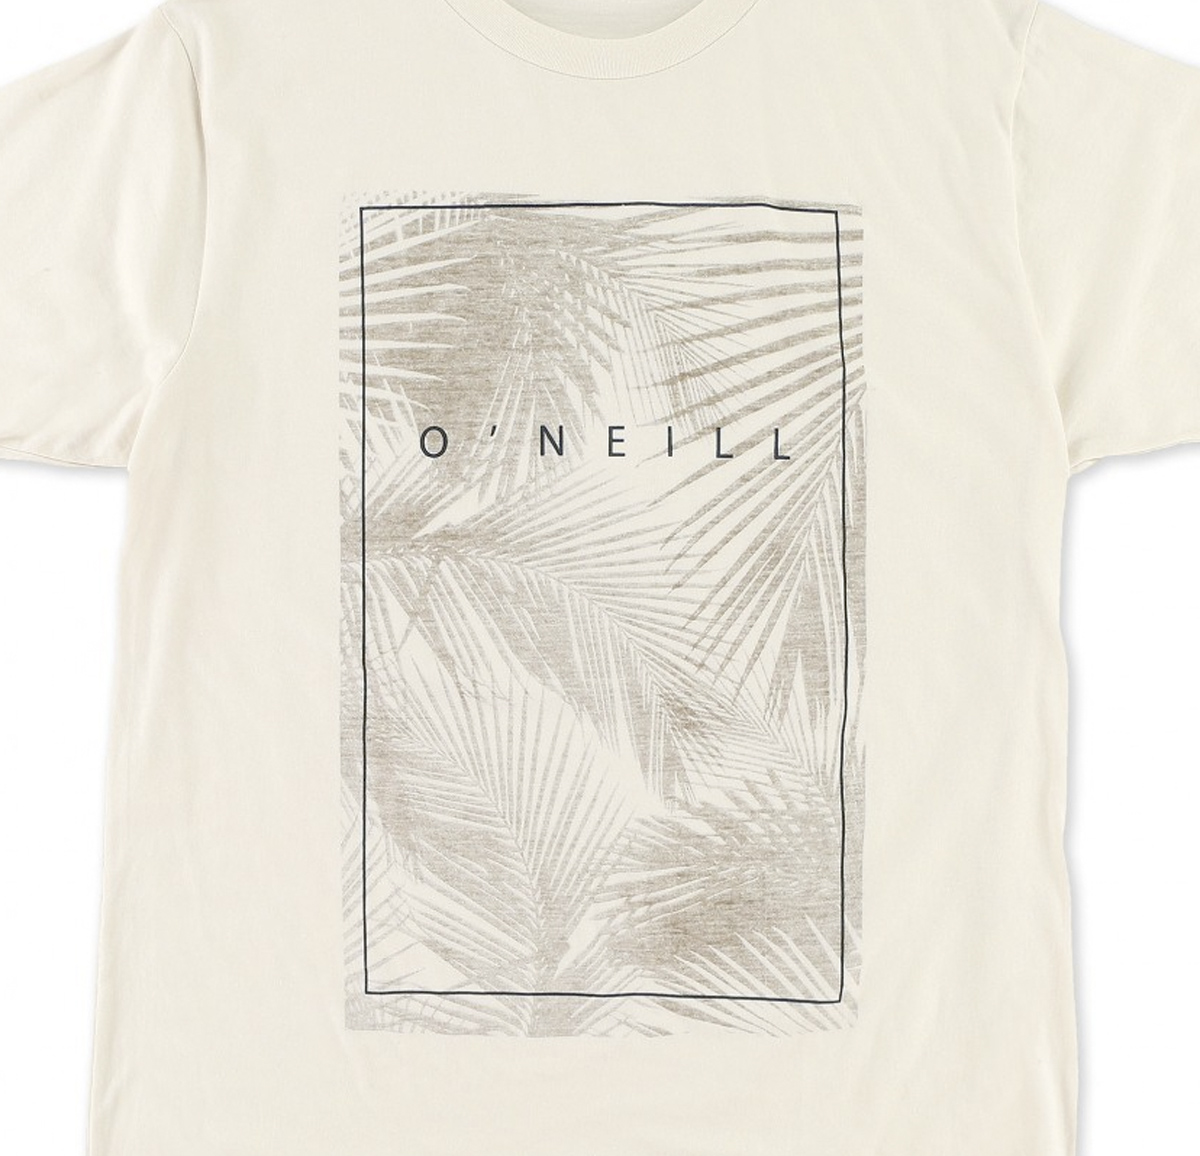 Reverse screen printed t-shirt